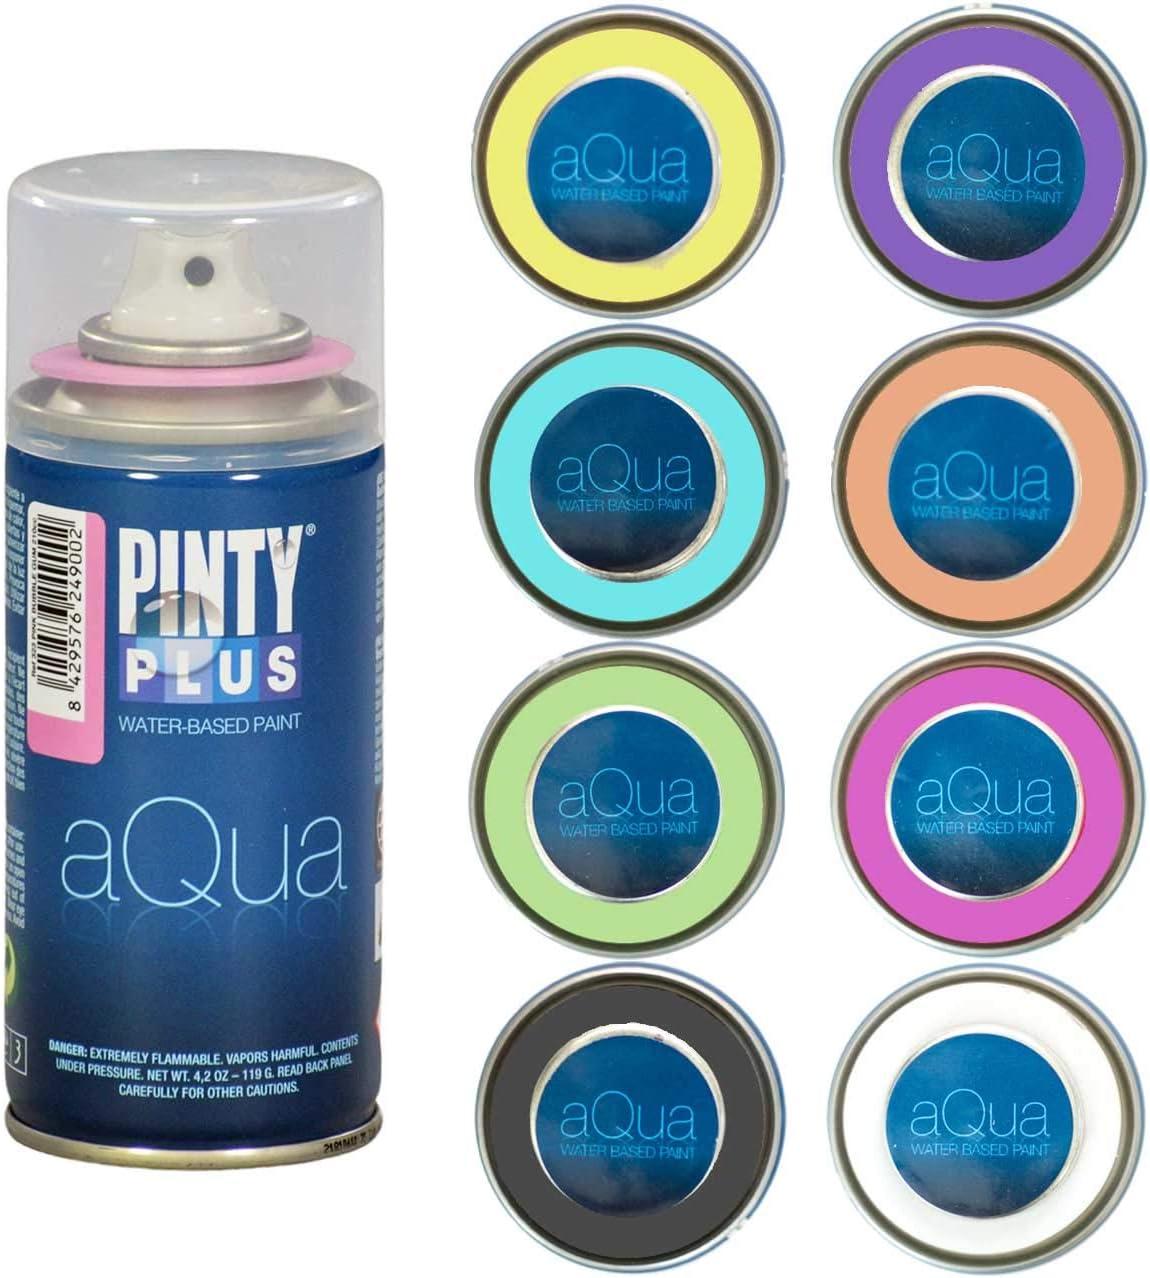 Pintyplus Aqua Spray Paint Set of Eight